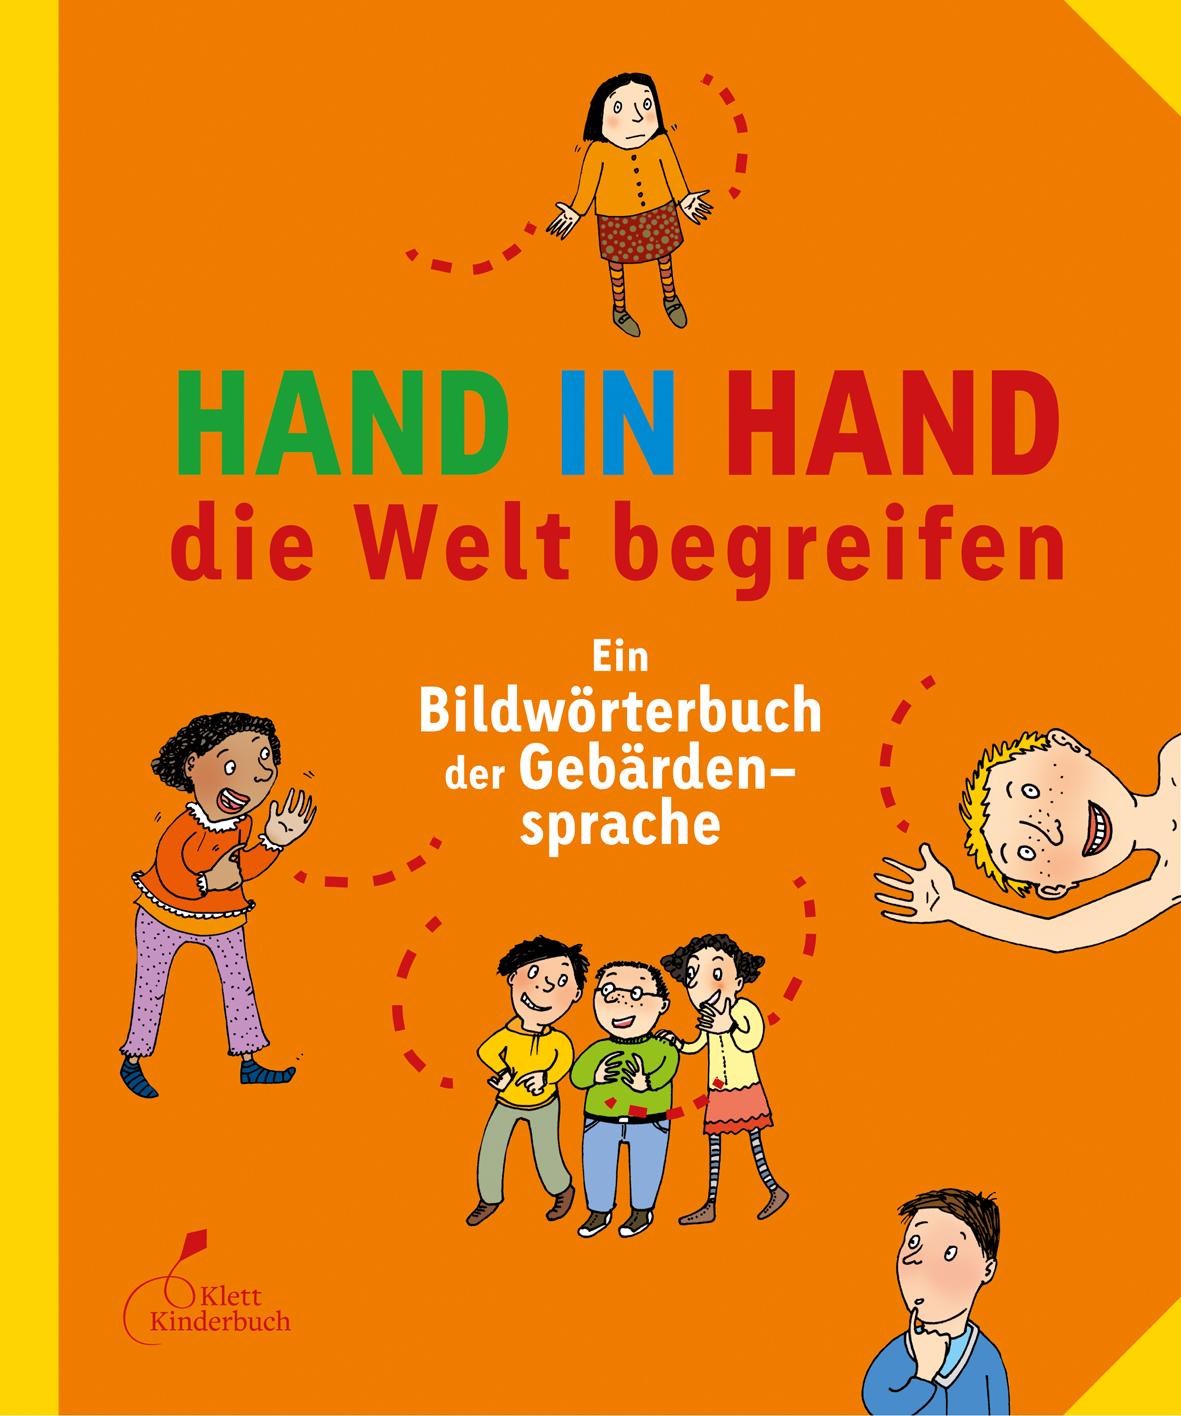 HAND IN HAND die Welt begreifen Book Cover